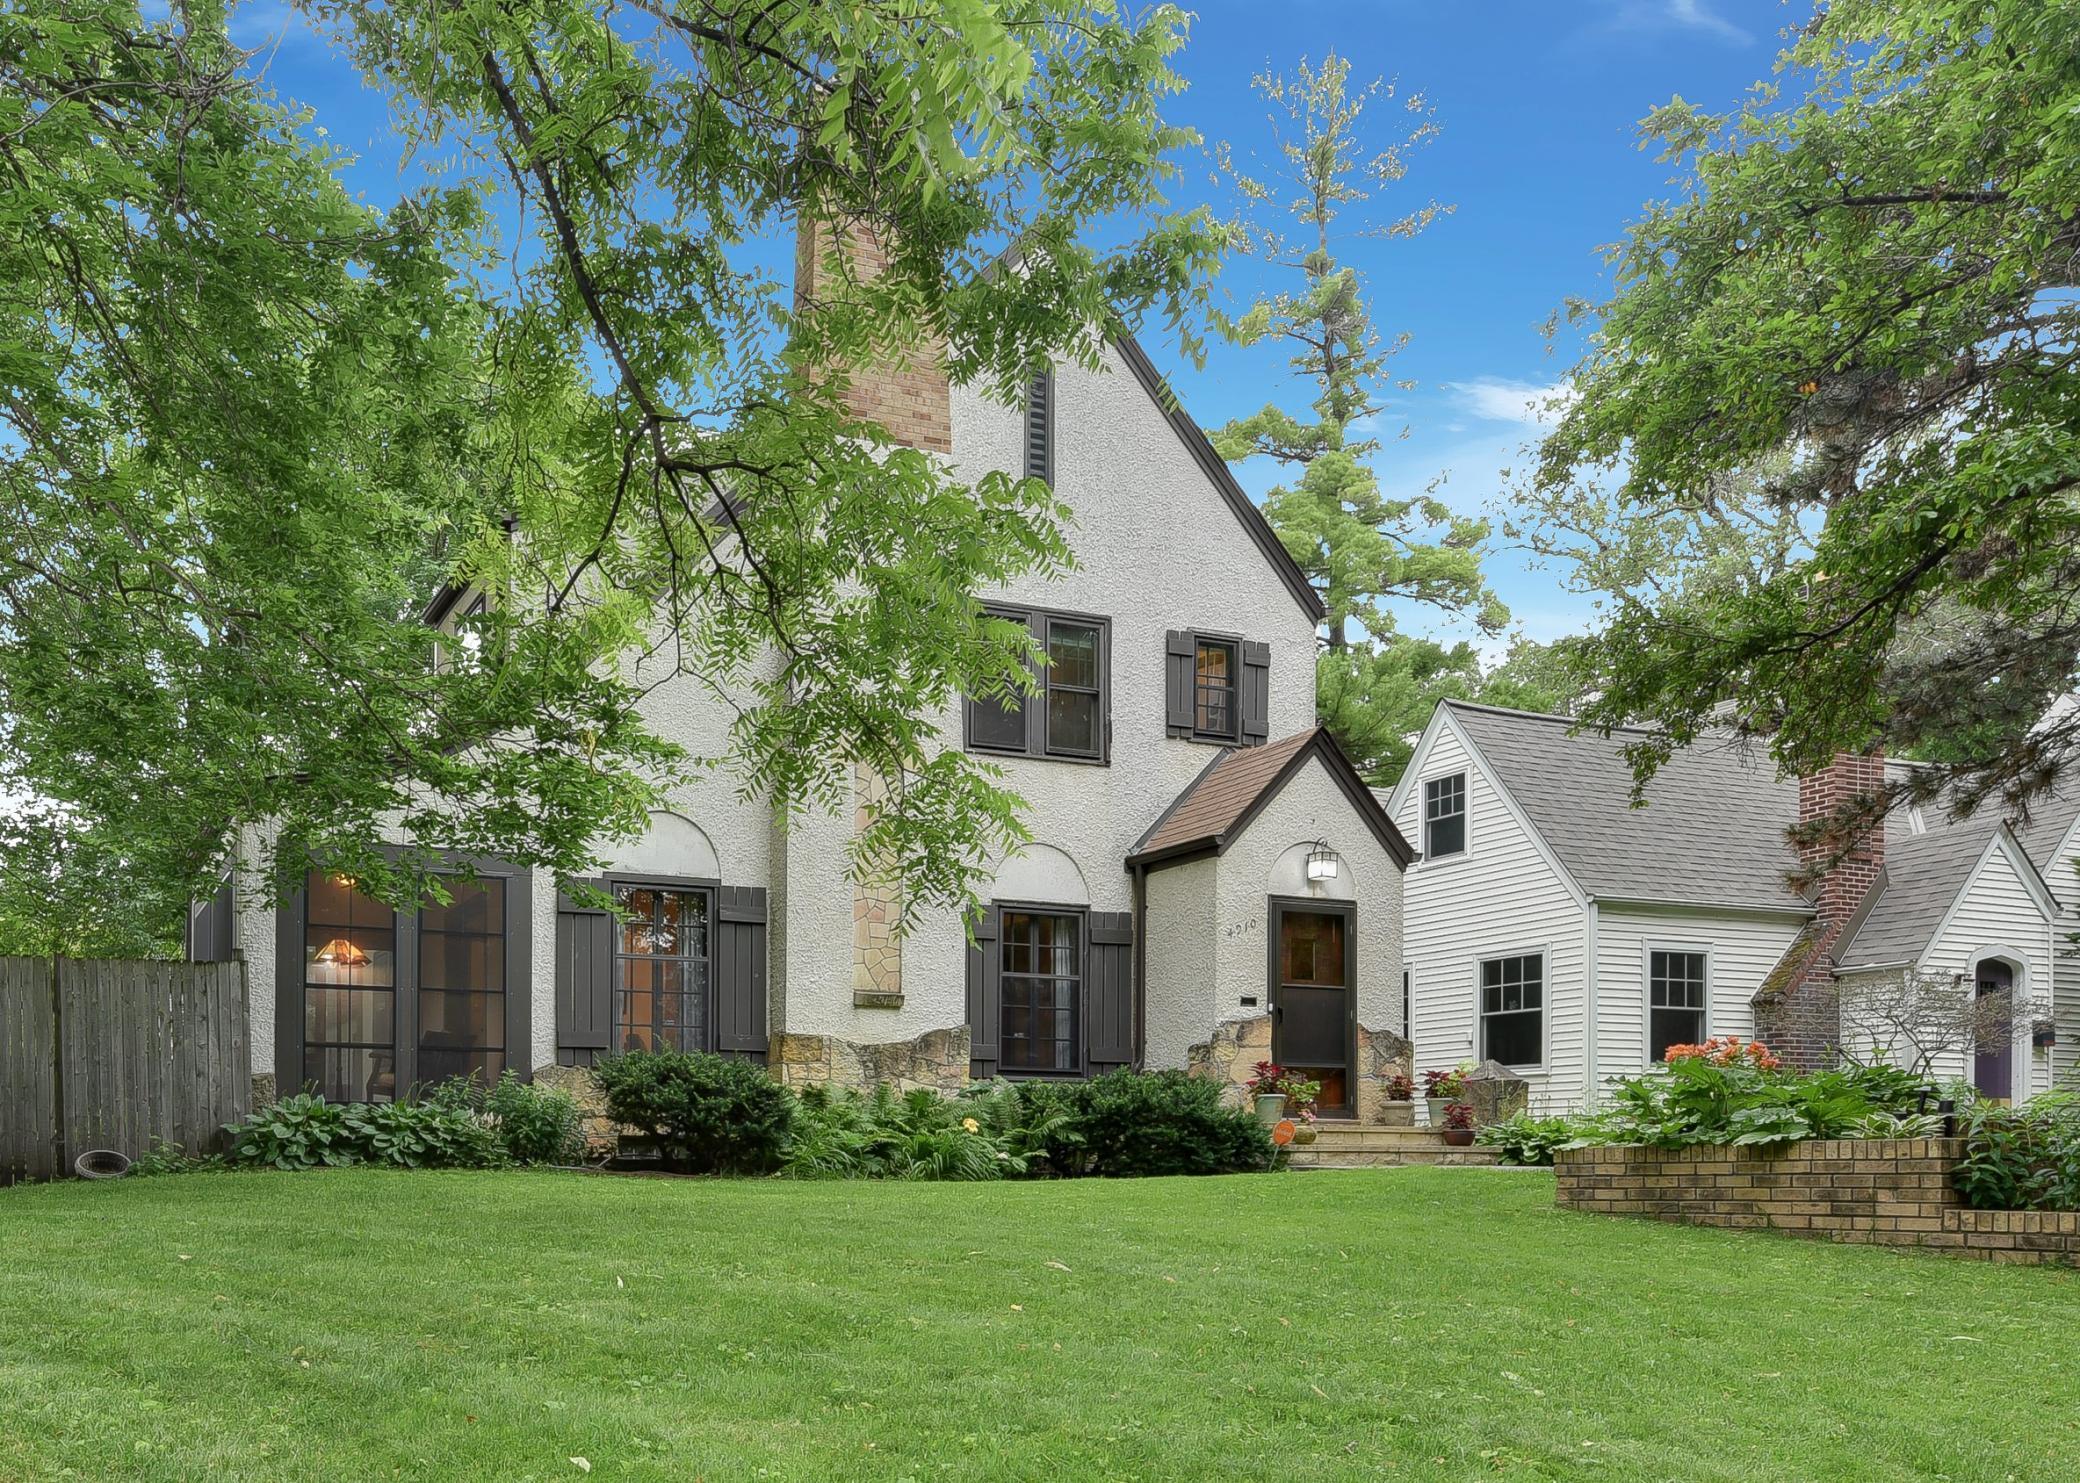 4910 12th S Property Photo - Minneapolis, MN real estate listing